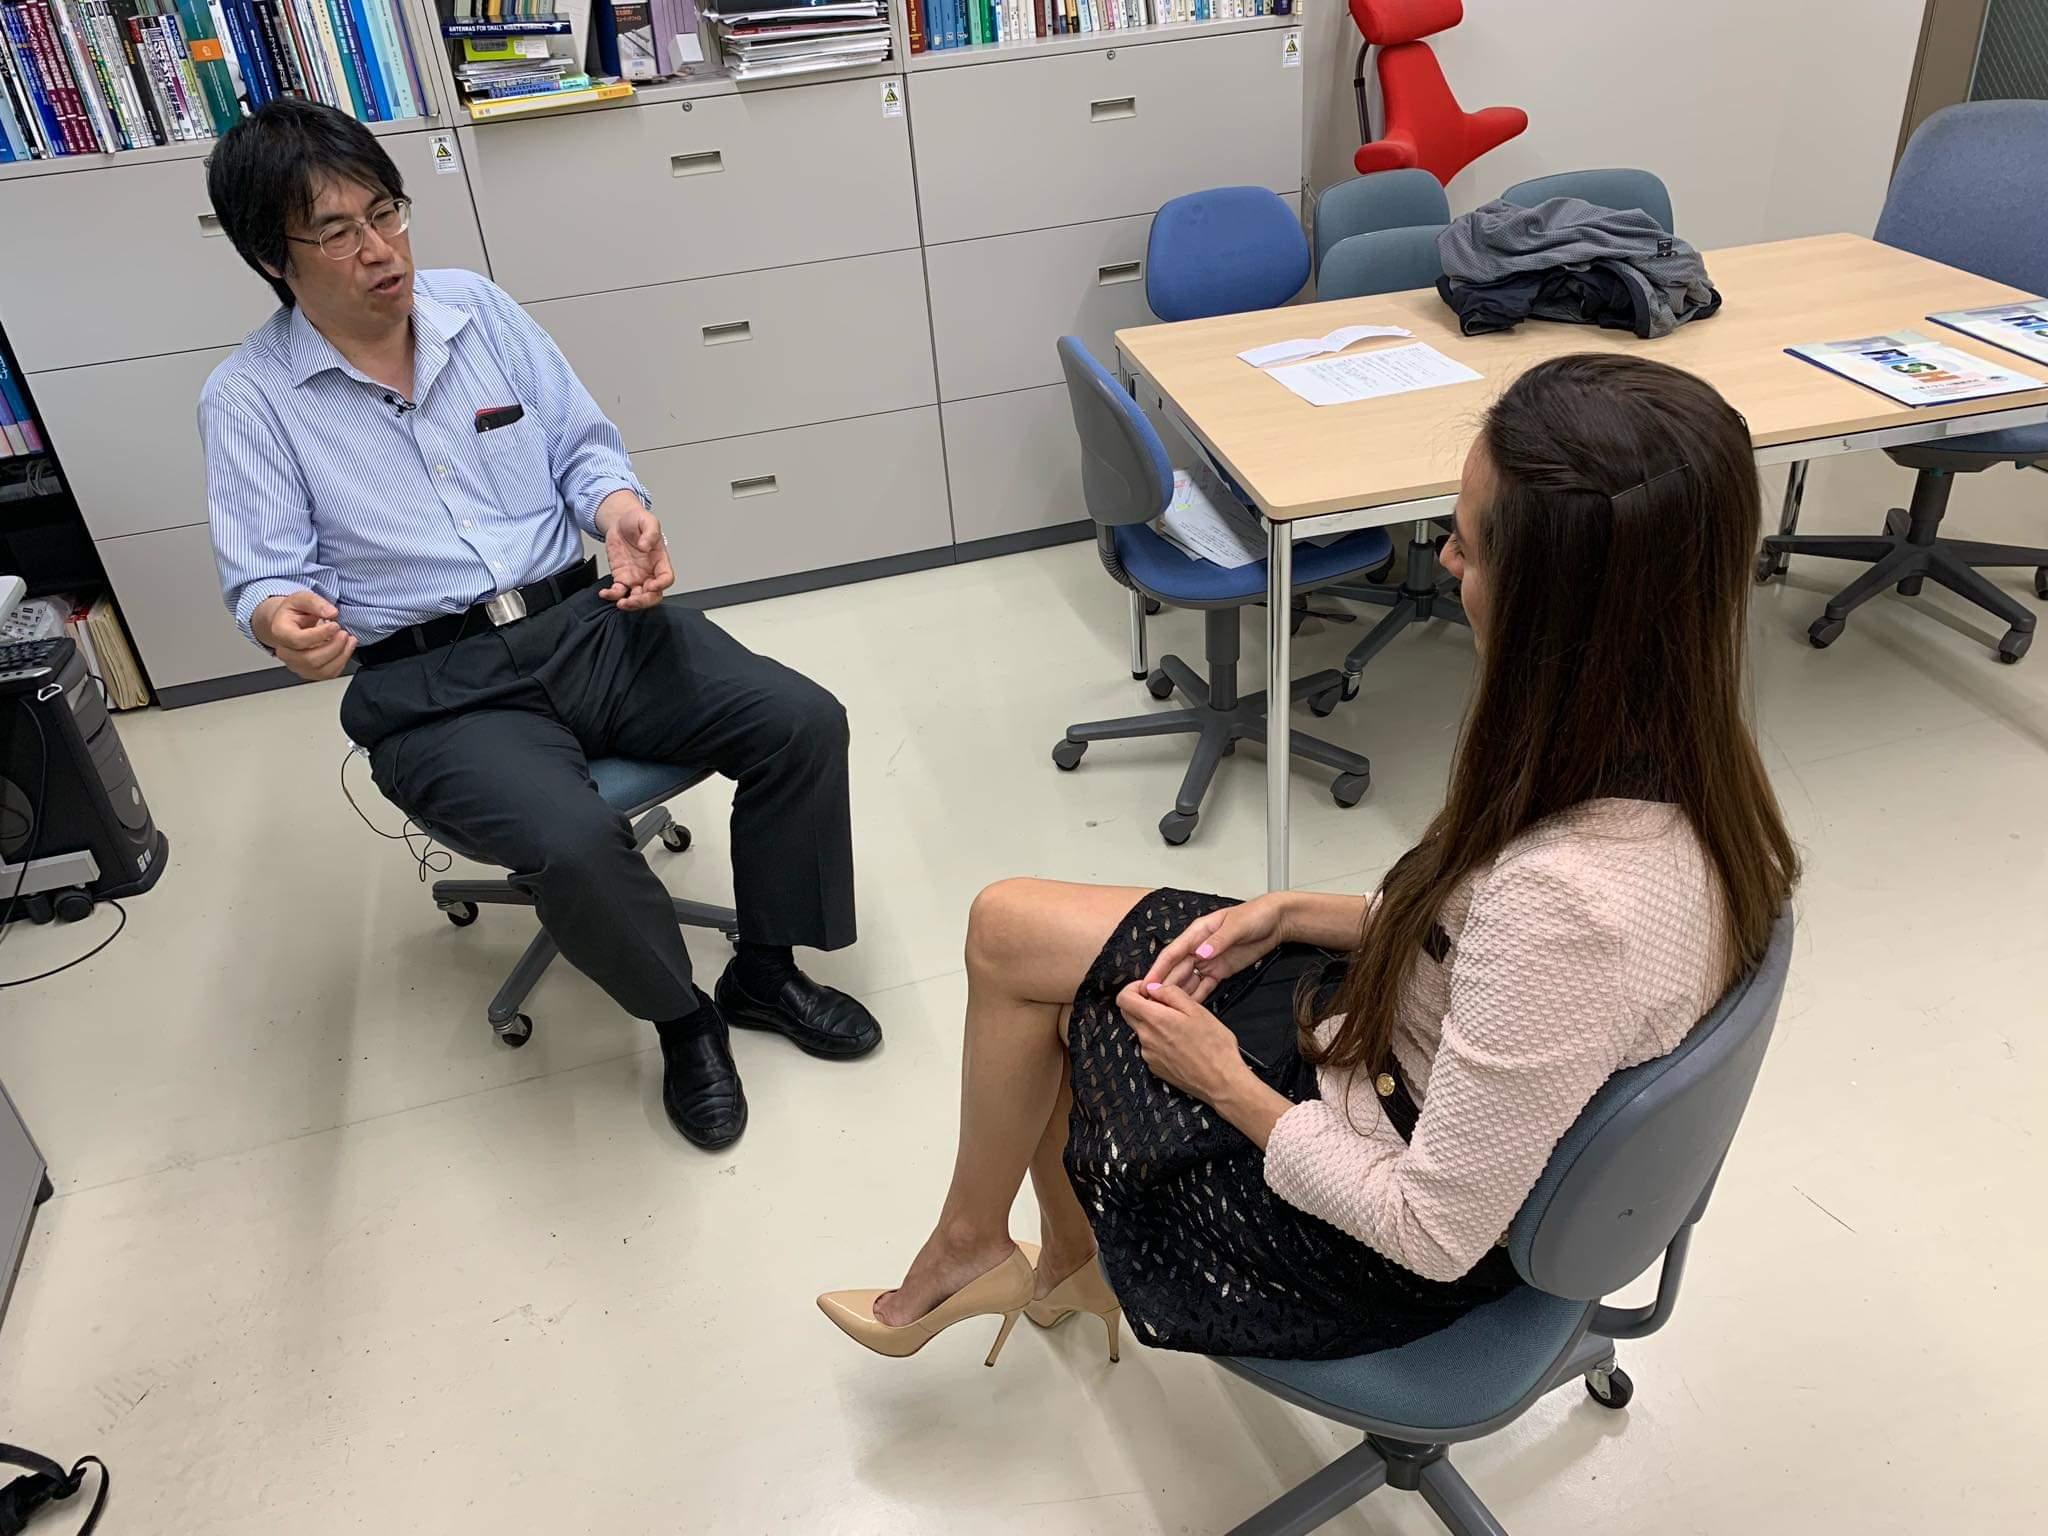 Valery Danko interviews professor Shinohara